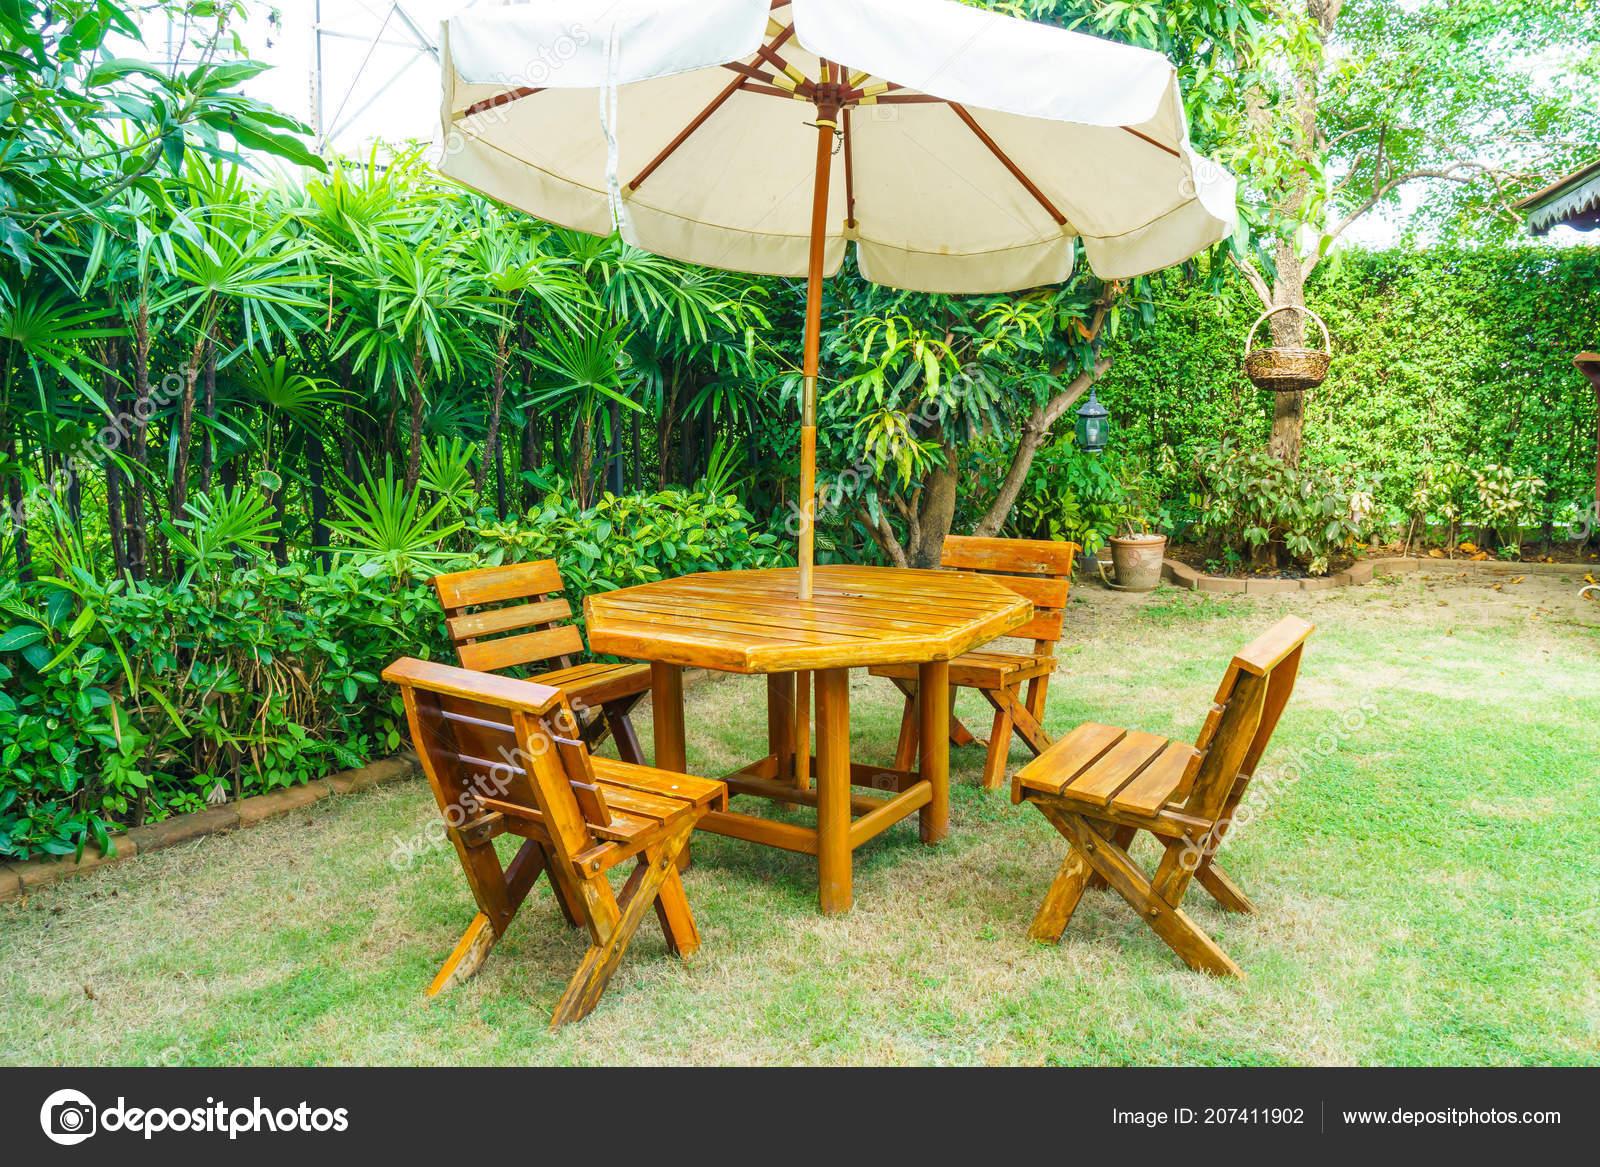 Lege houten terras tafel stoel decoratie huis tuin u stockfoto